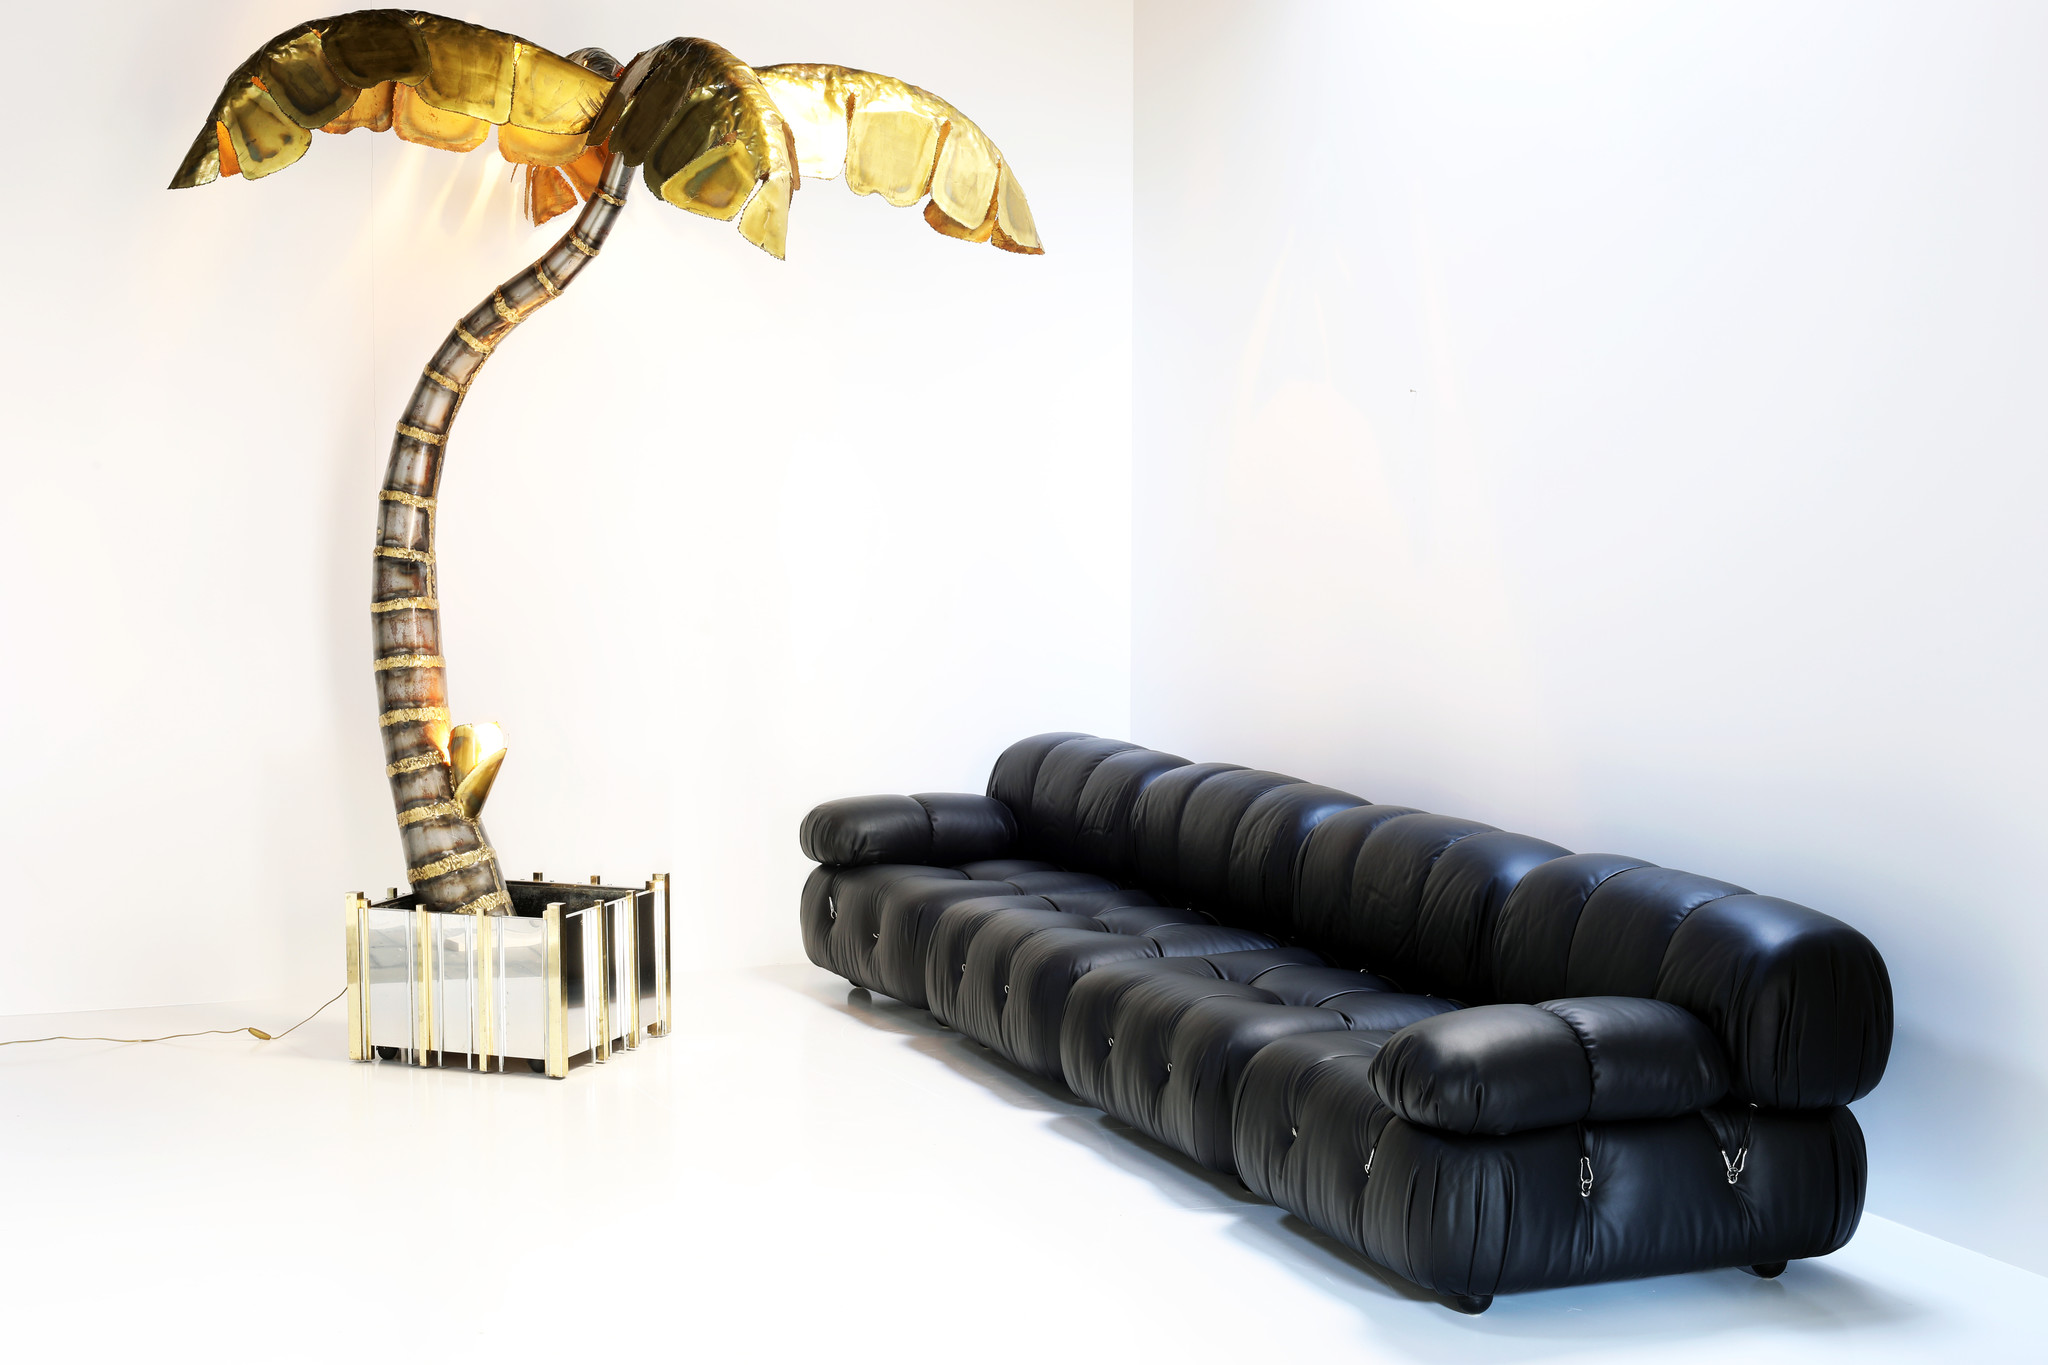 Camaleonda sofa designed by Mario Bellini for C & B / B & B Italia, 1971